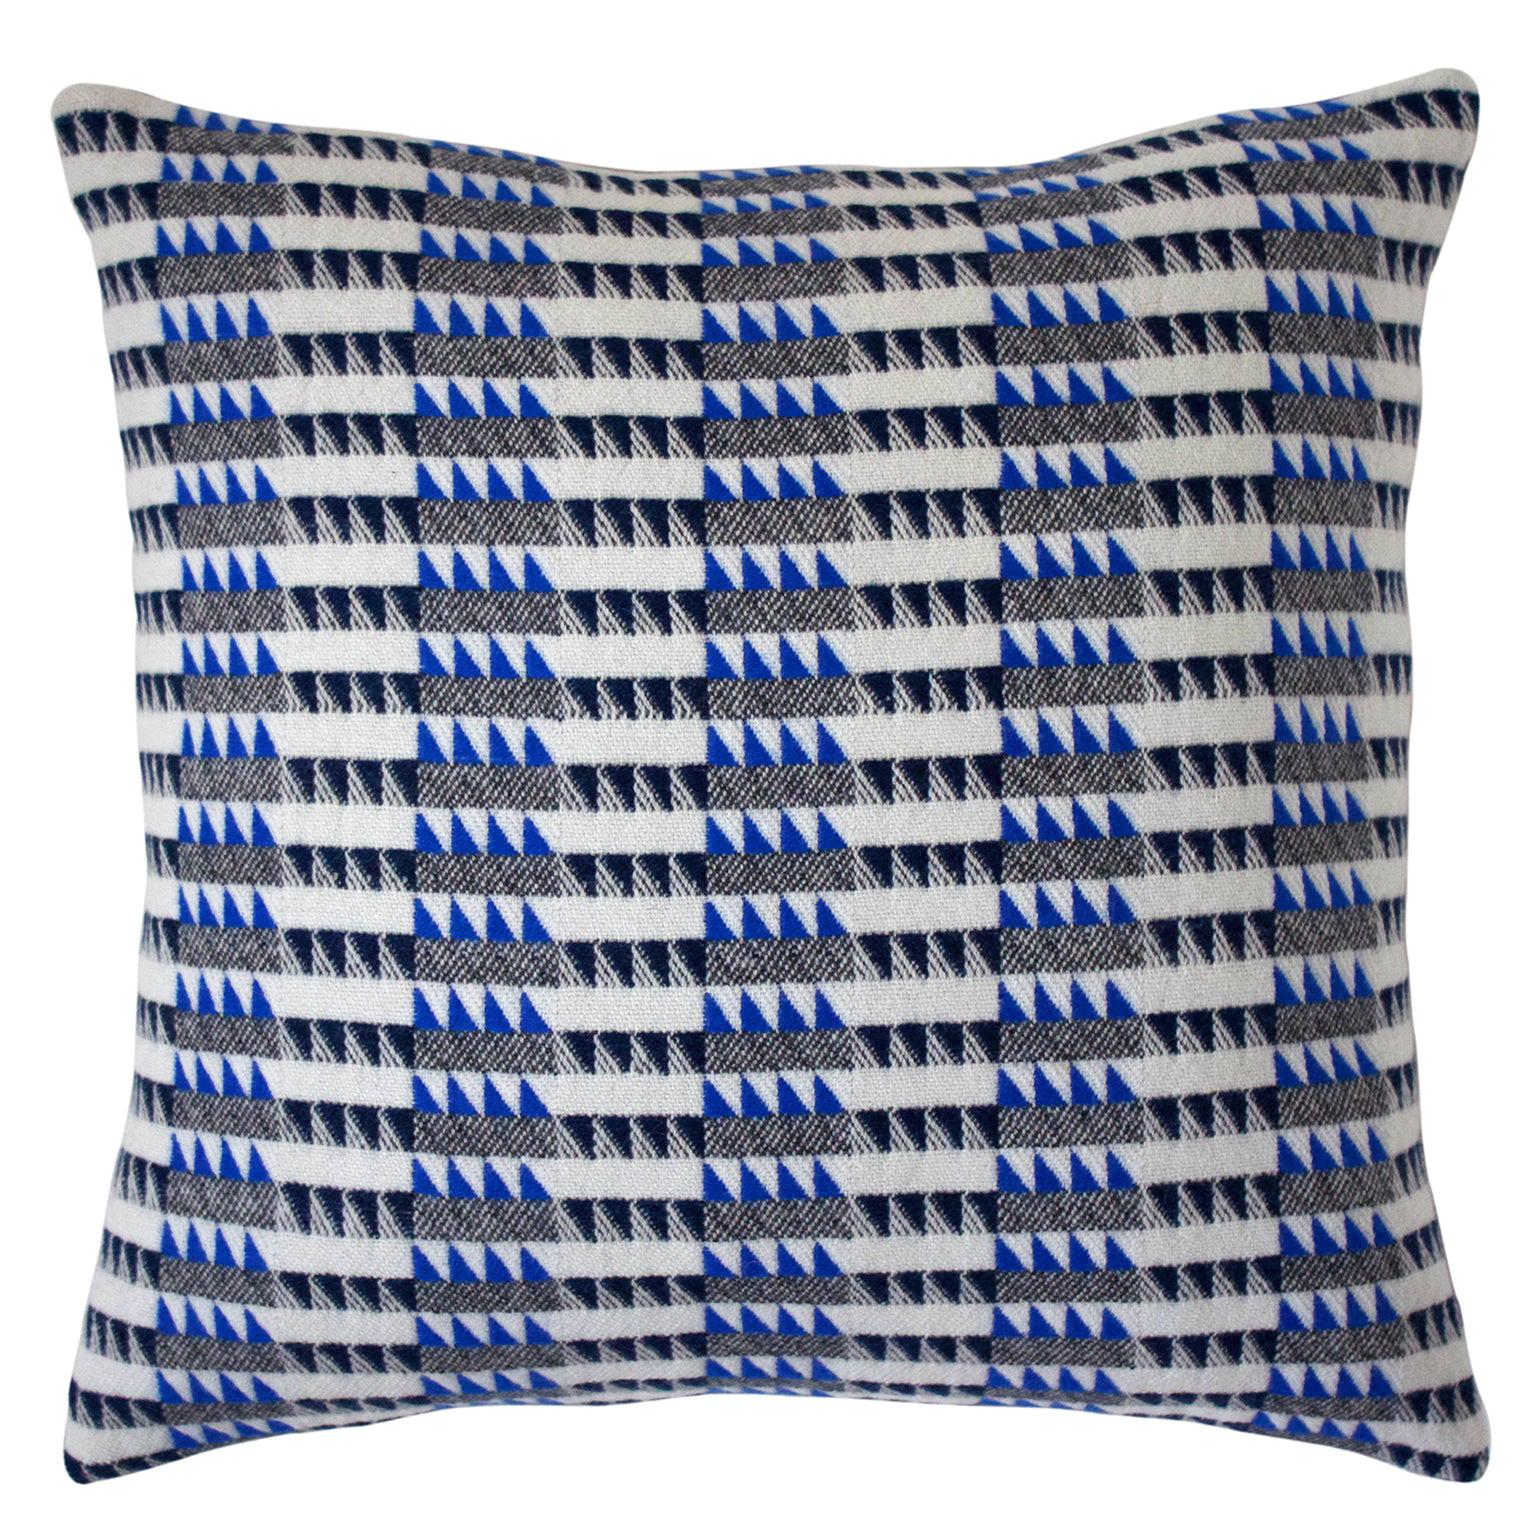 Handwoven 'Ixelles' Geometric Merino Wool Cushion Pillow, Indigo/Colbalt Blue